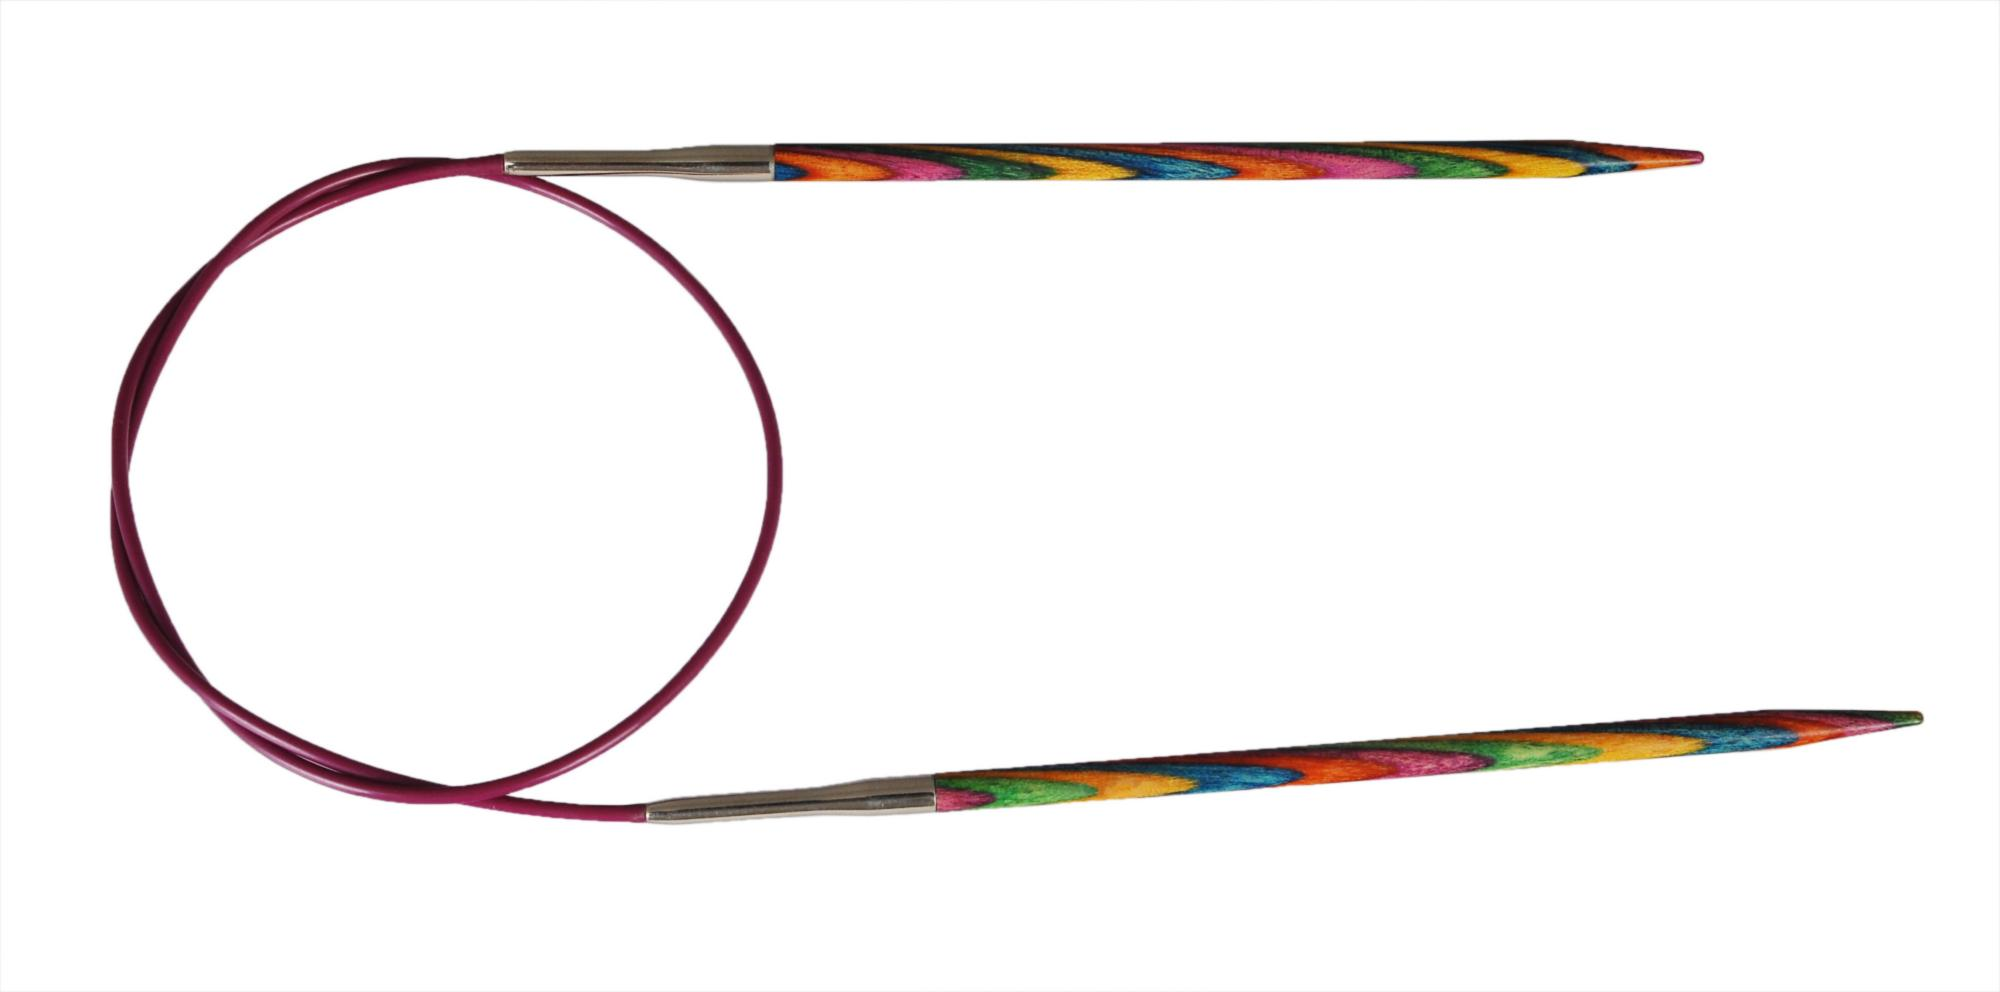 Спицы круговые 50 см Symfonie Wood KnitPro, 20383, 2.50 мм